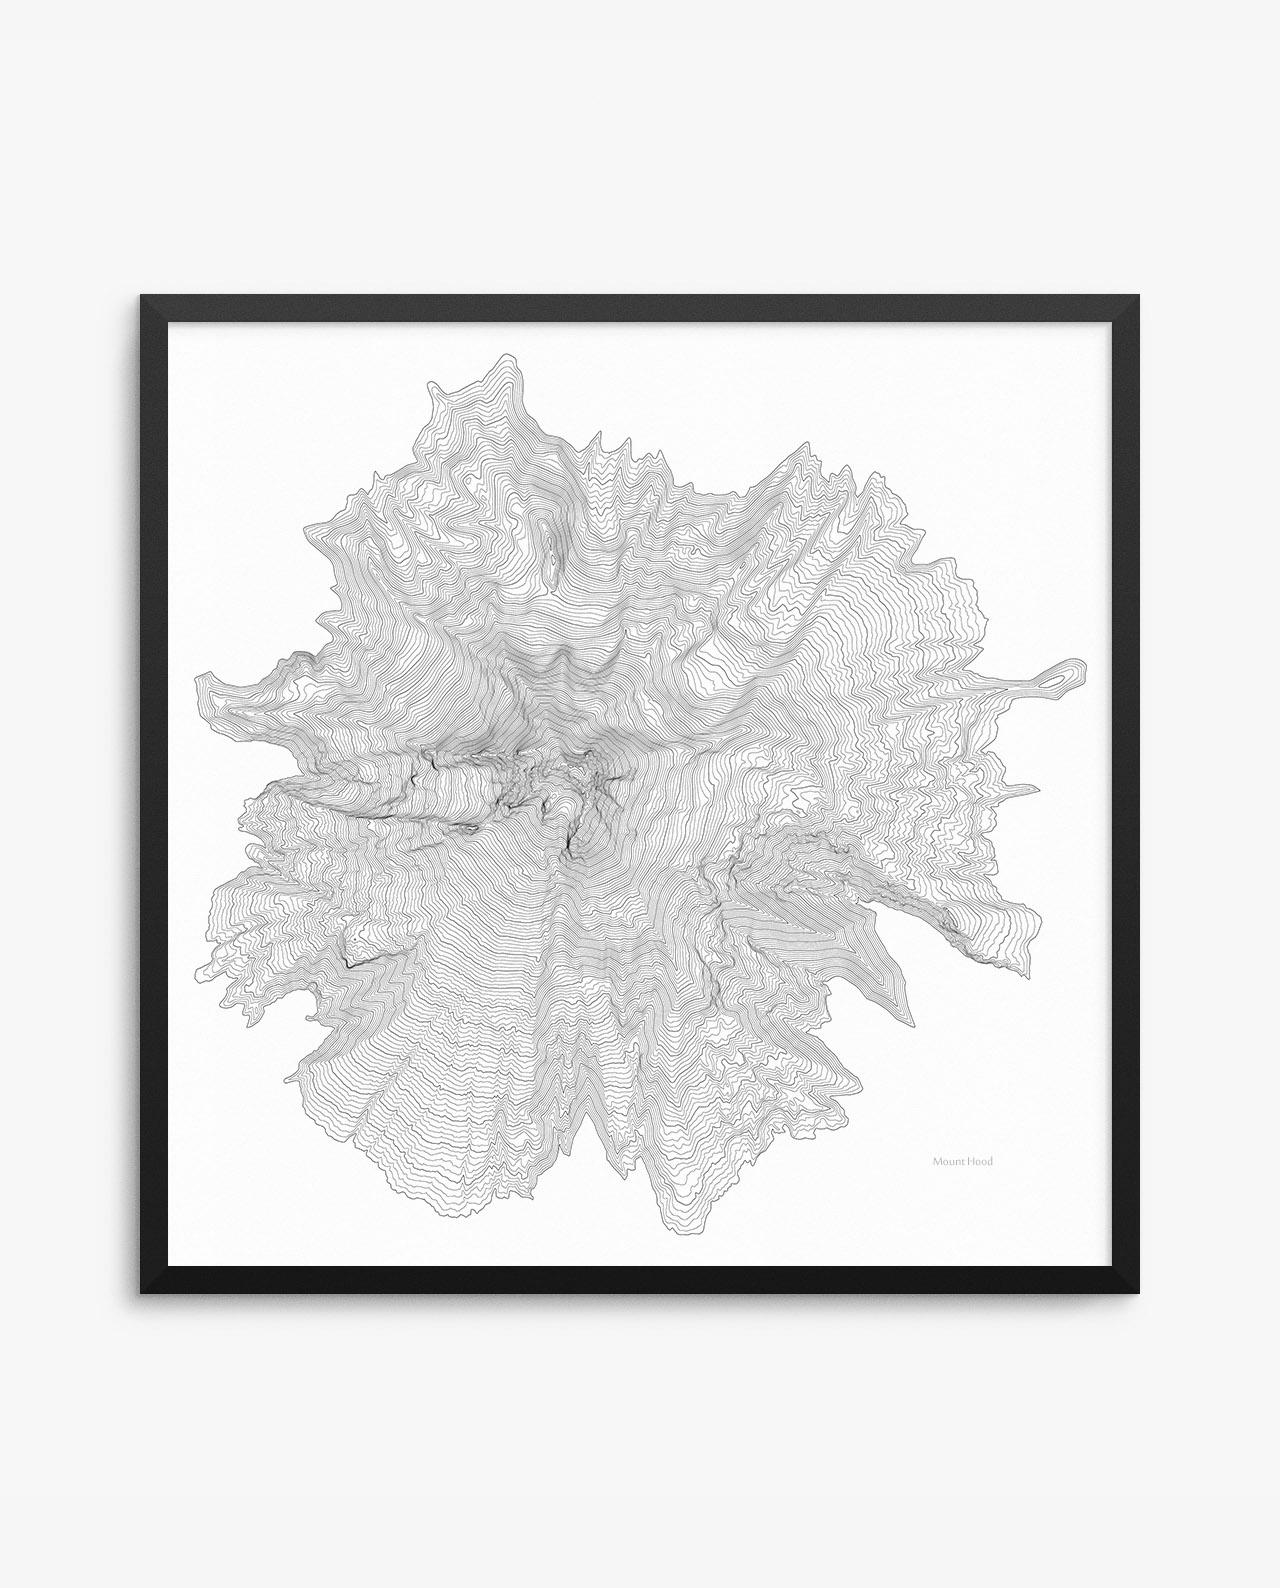 Mount Hood Contours White Framed Poster